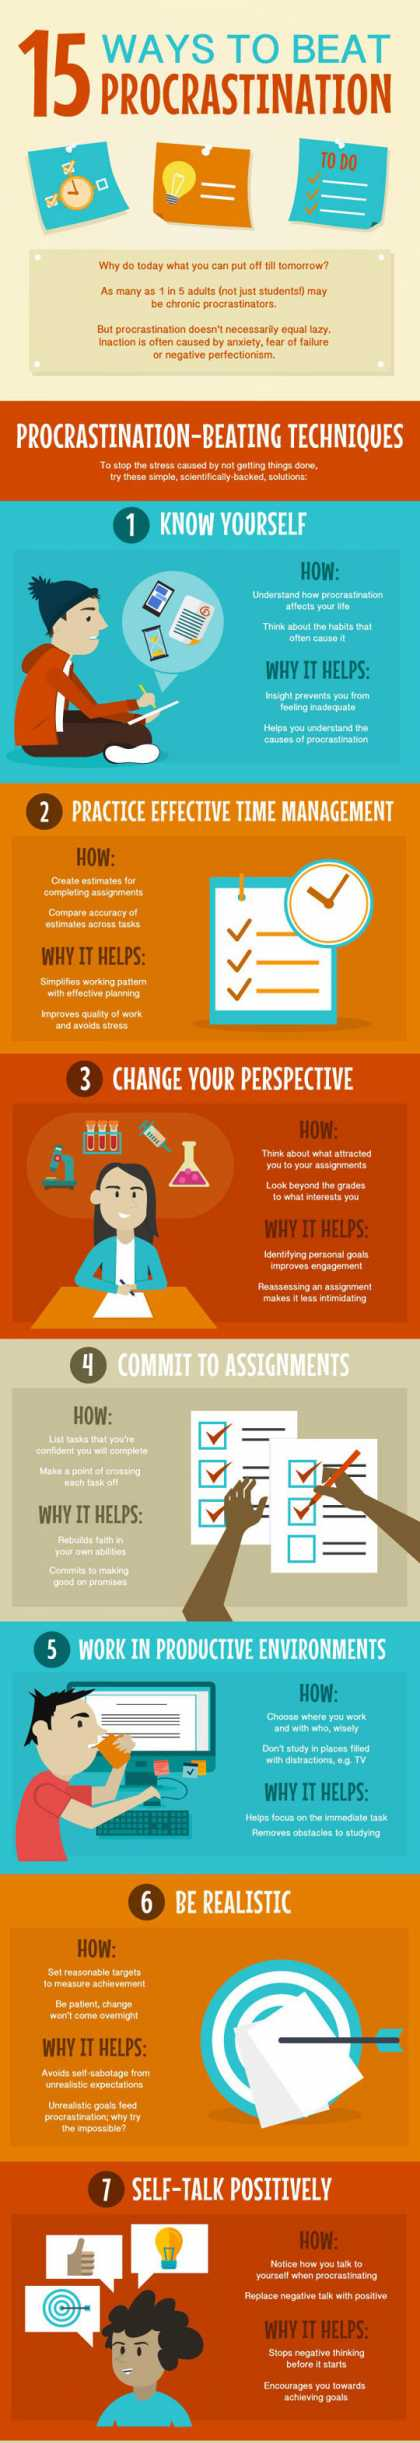 15 Ways To Beat #Procrastination